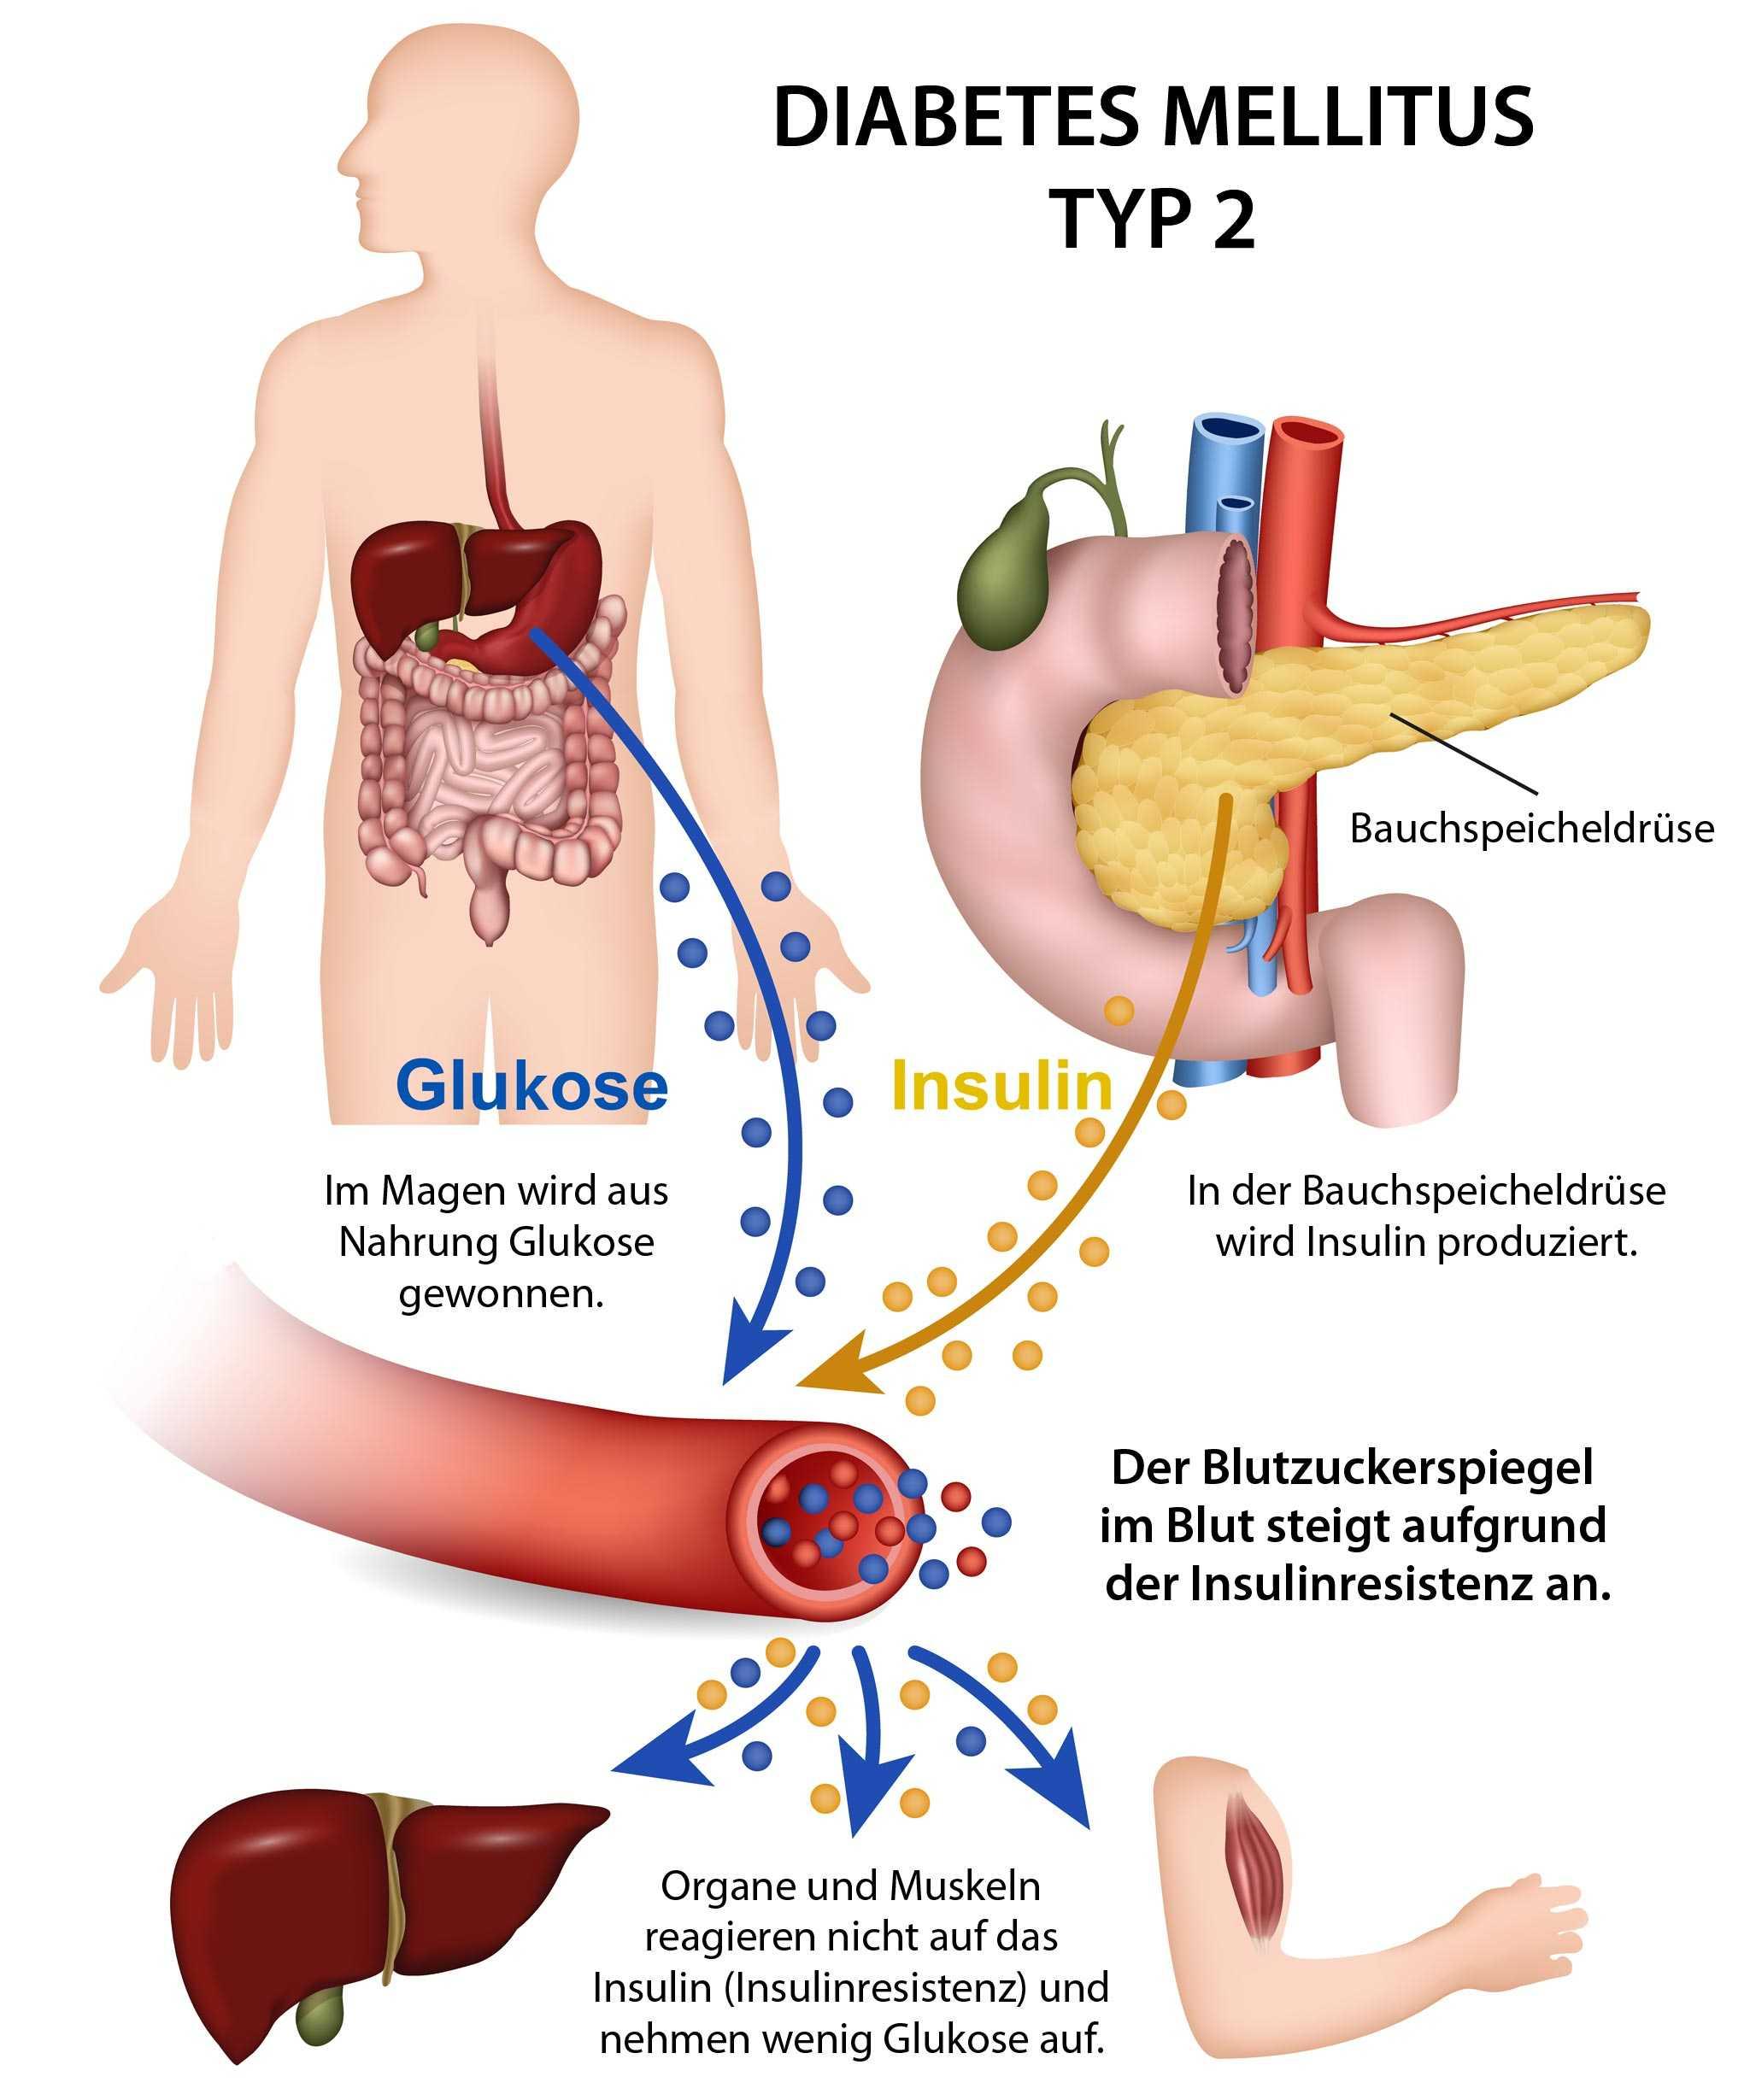 Ballaststoffe sind bei Diabetes unverzichtbar - Diabetes mellitus